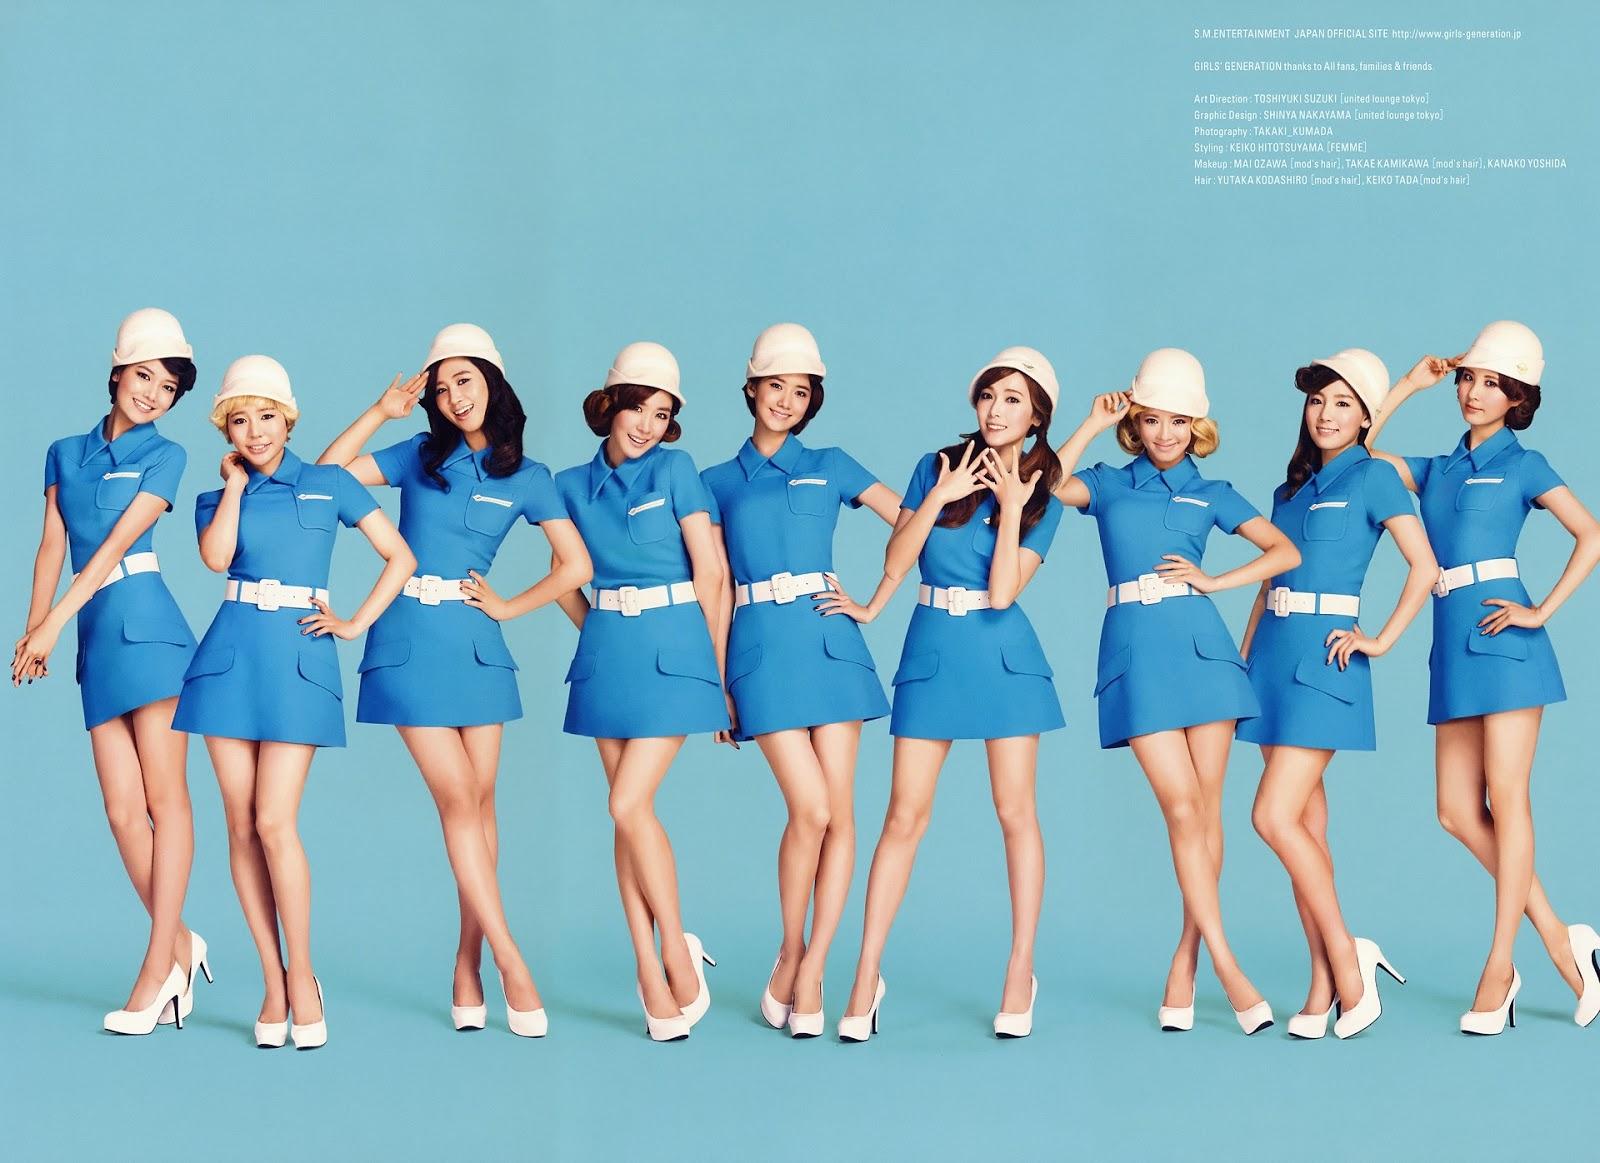 girls generation hd - photo #35